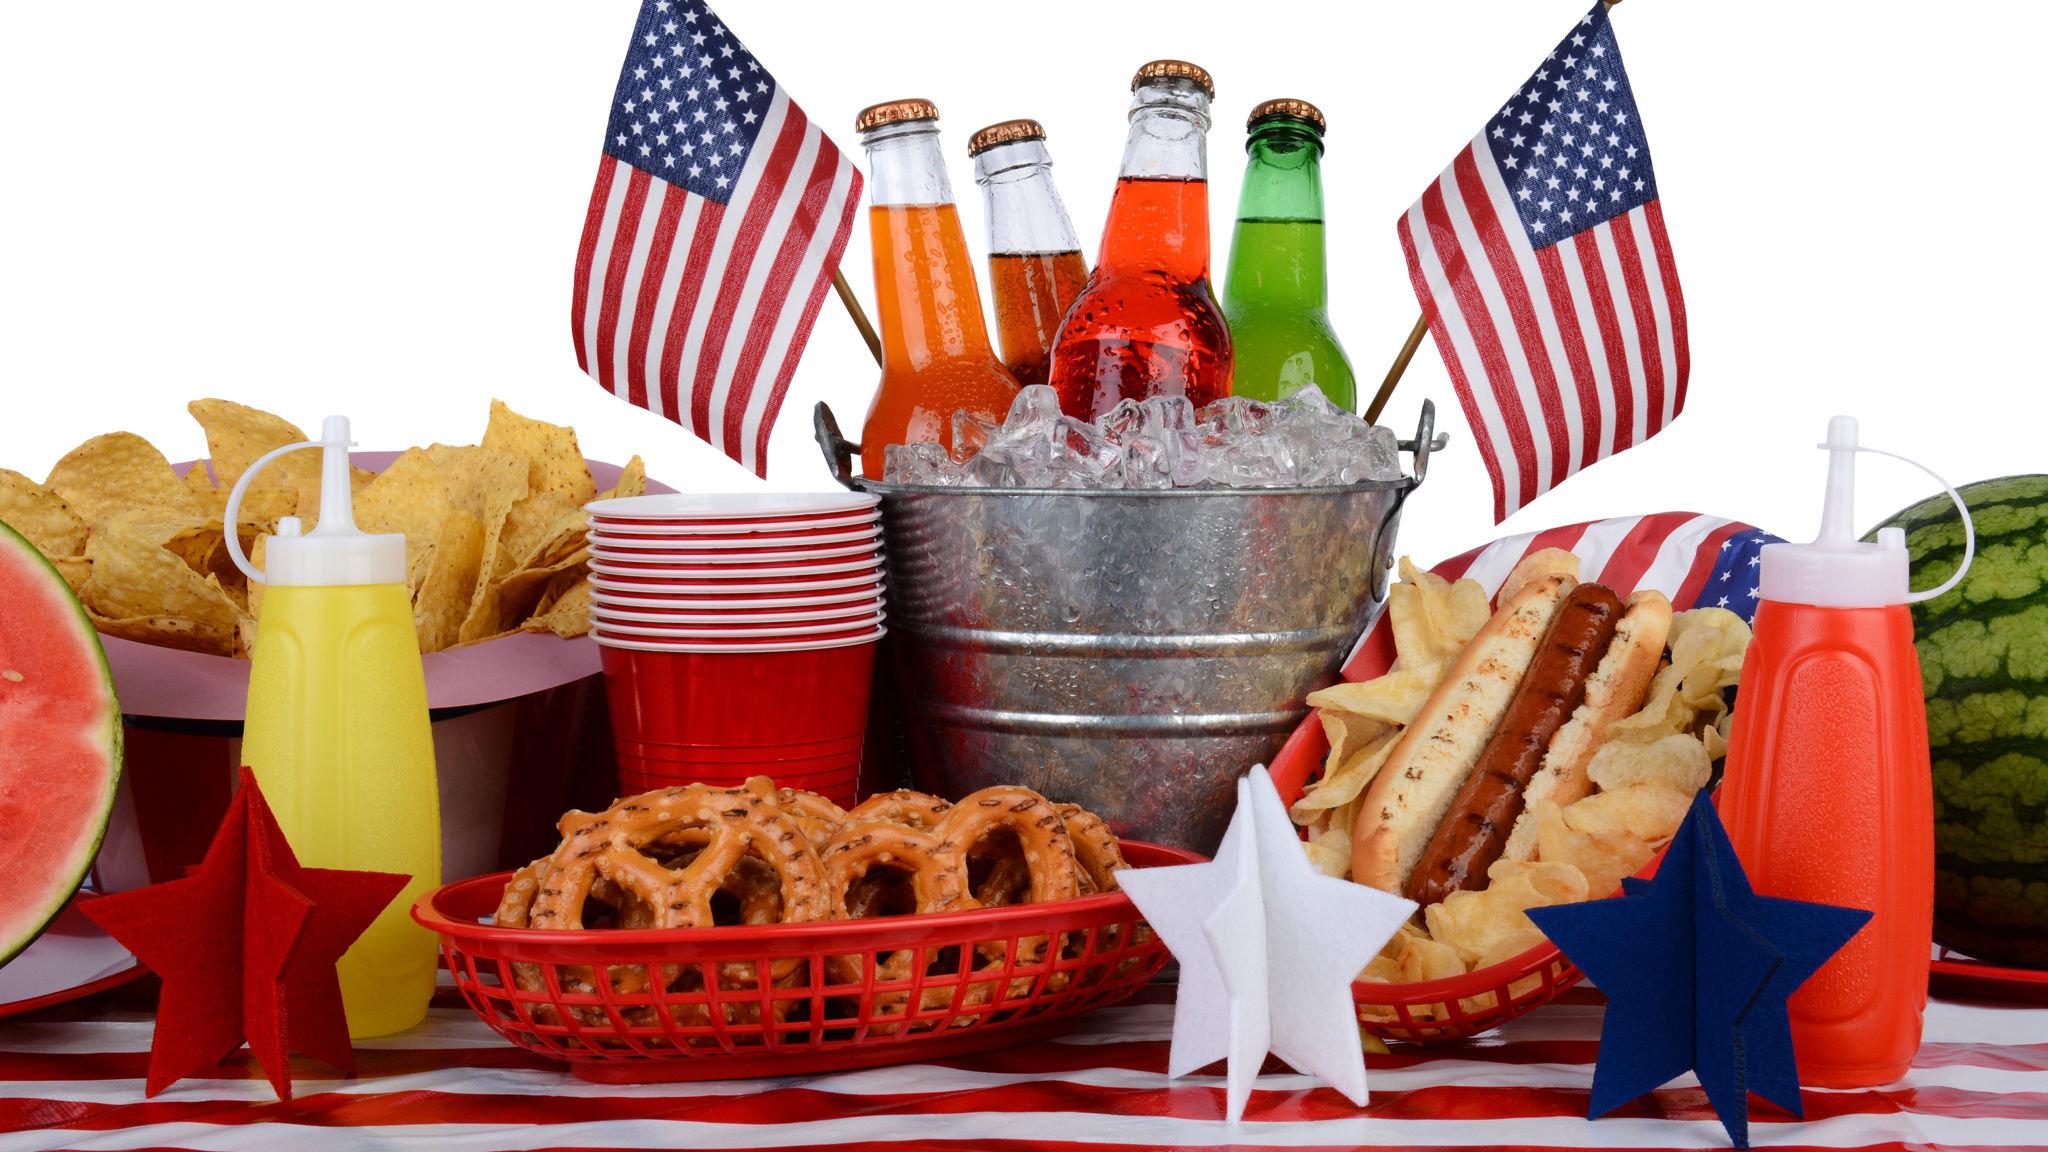 Americans broaden their July 4 appetites beyond beer and burgers